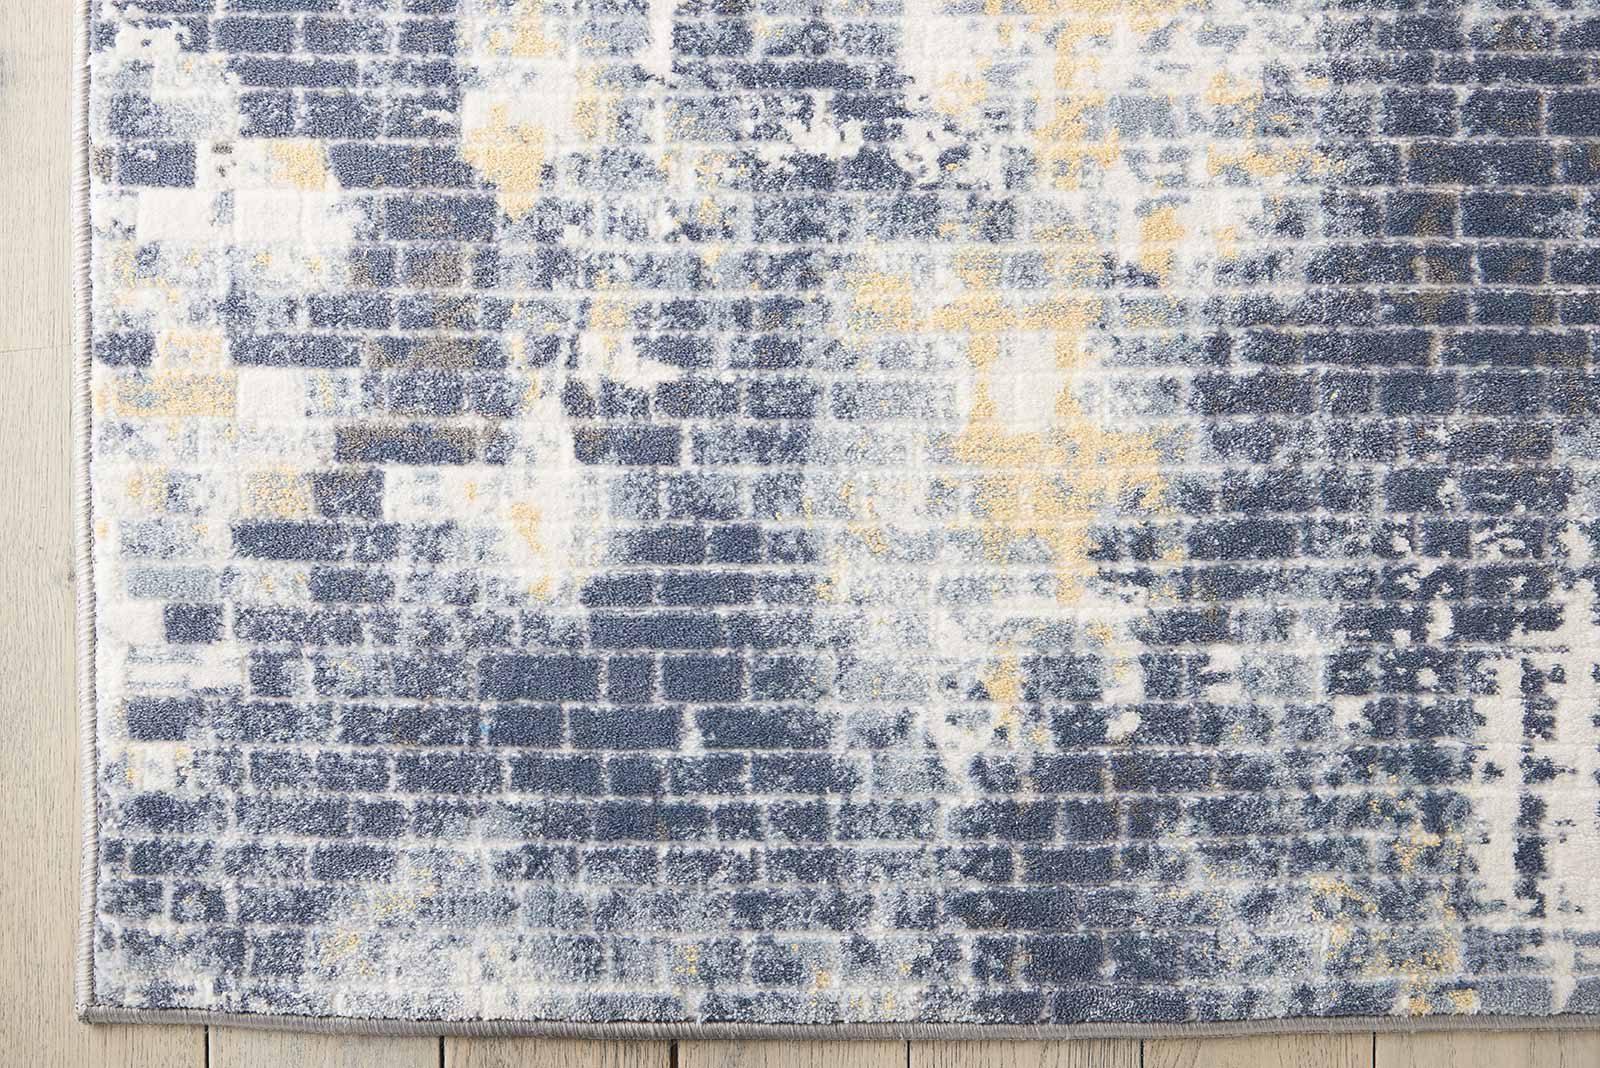 Nourison rug Urban Decor URD05 IVSKY 5x7 099446467188 CR01